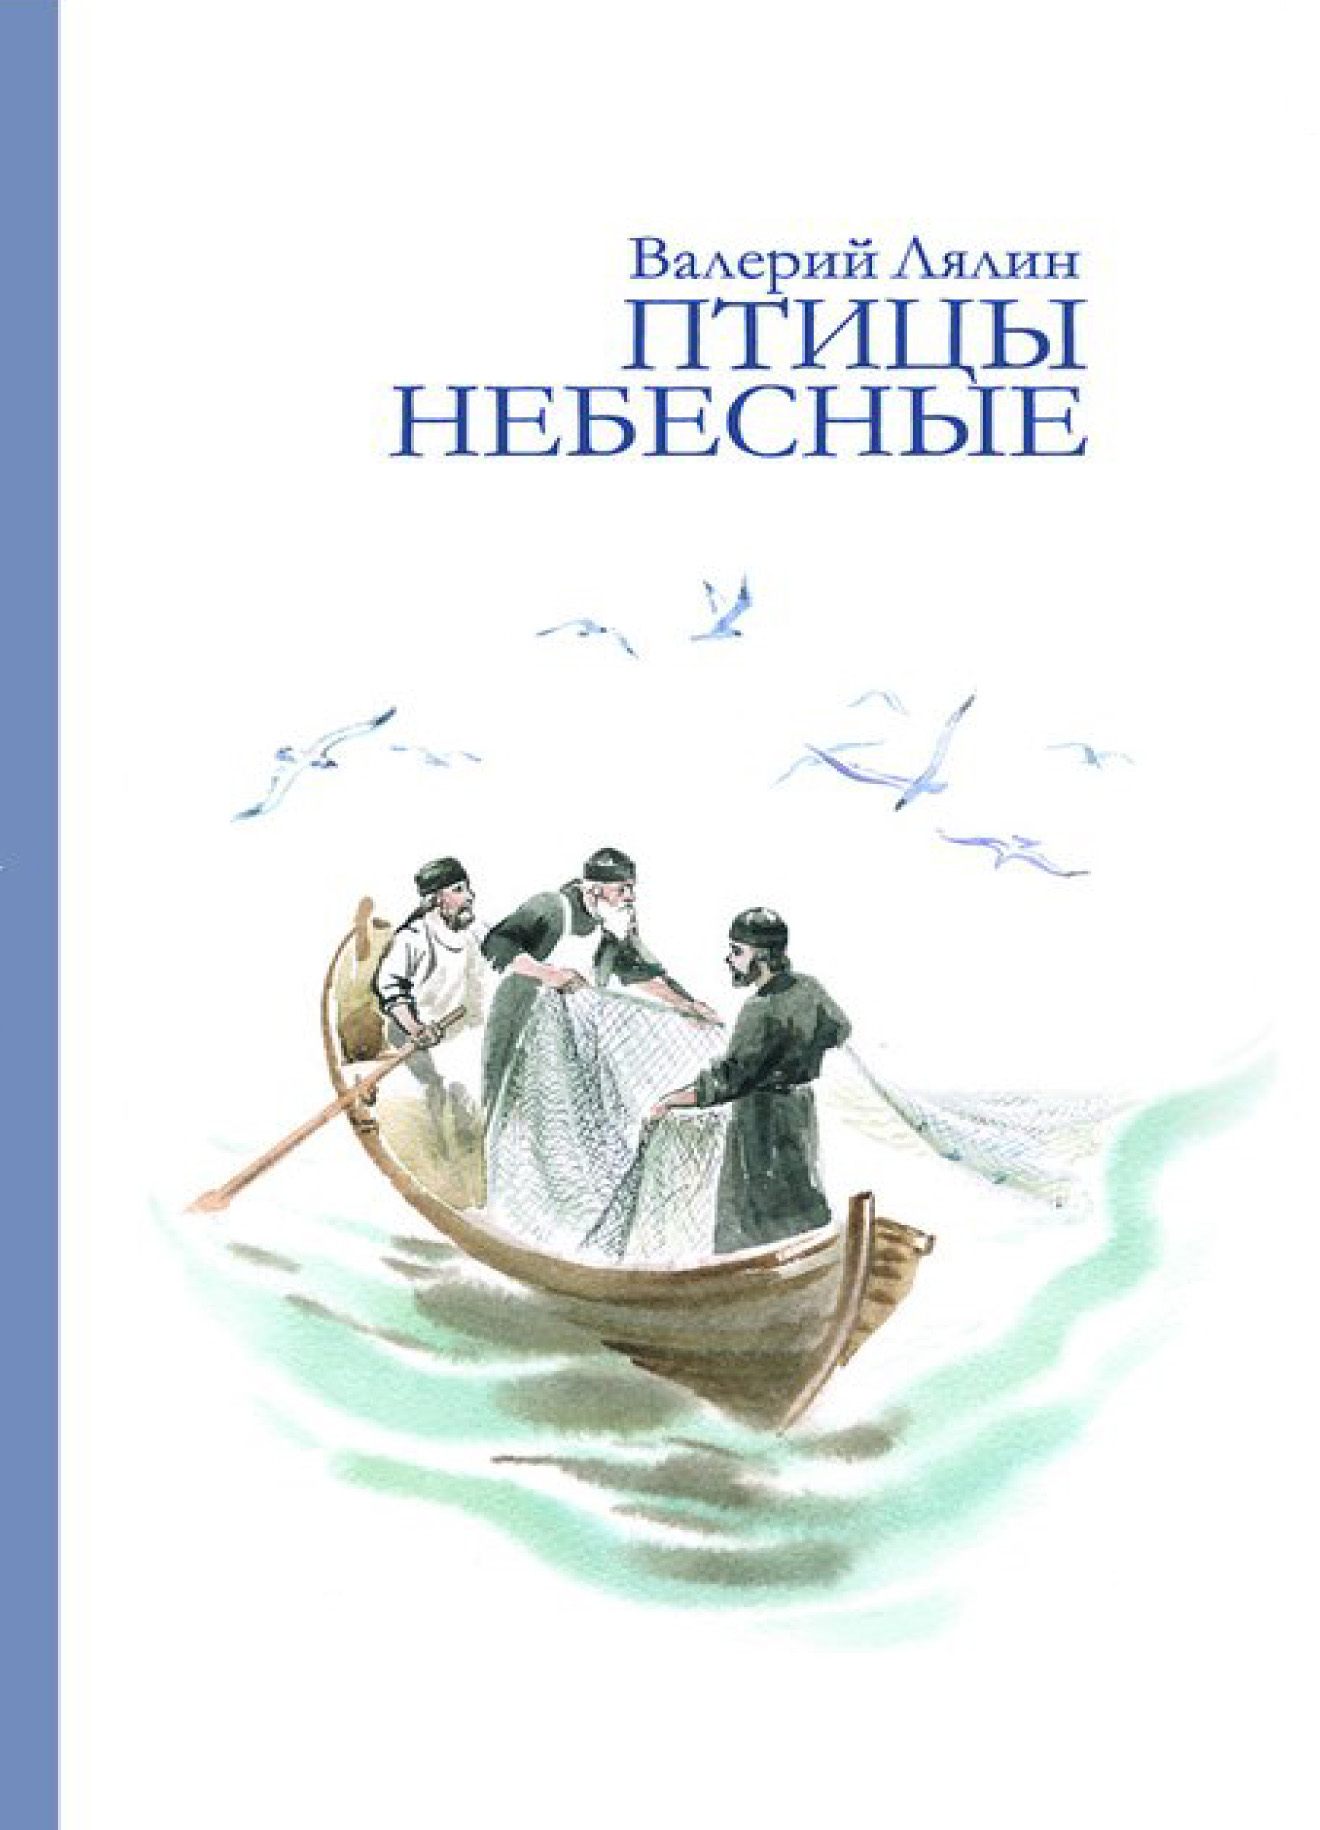 Валерий Лялин Птицы небесные (сборник) валерий лялин последняя надежда сборник